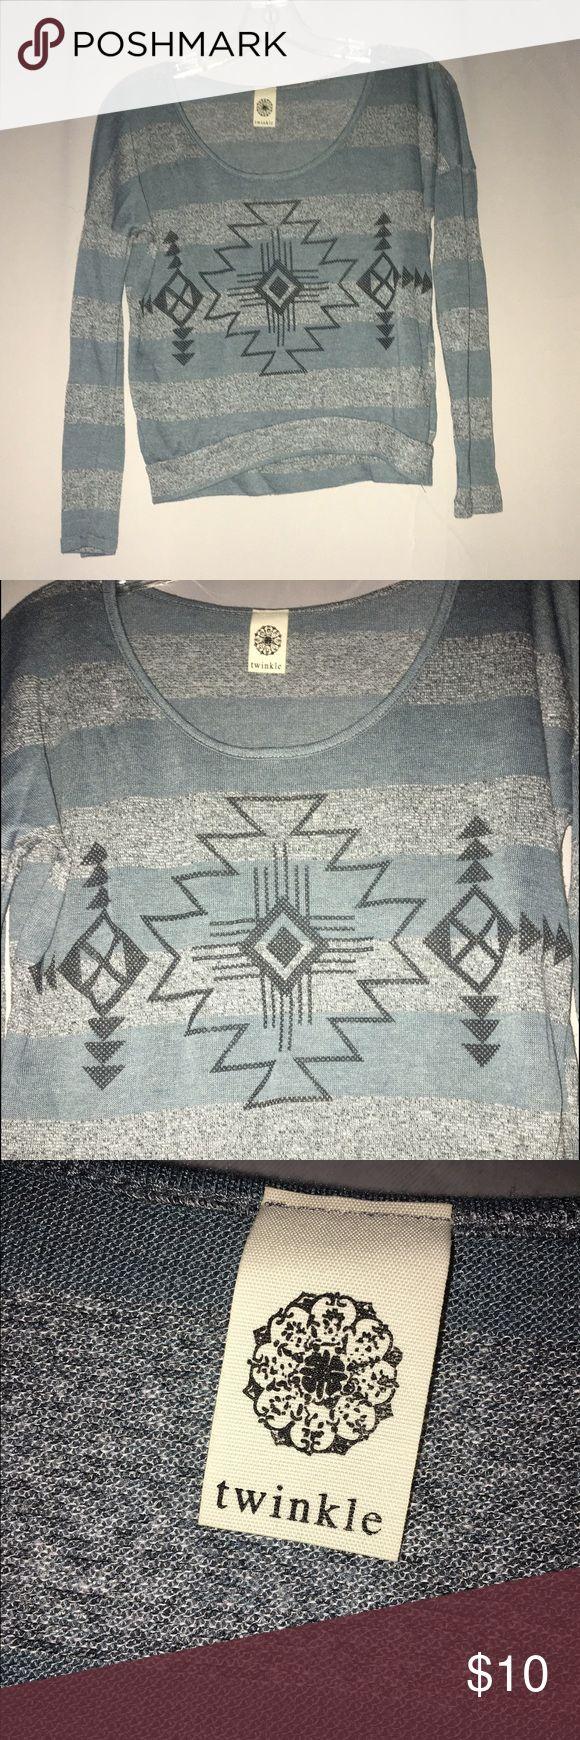 Aztec long-sleeve top Thin, tribal pattern crop top. Pair with leggings or high waisted jeans! Minor wear. Twinkle Tops Tees - Long Sleeve